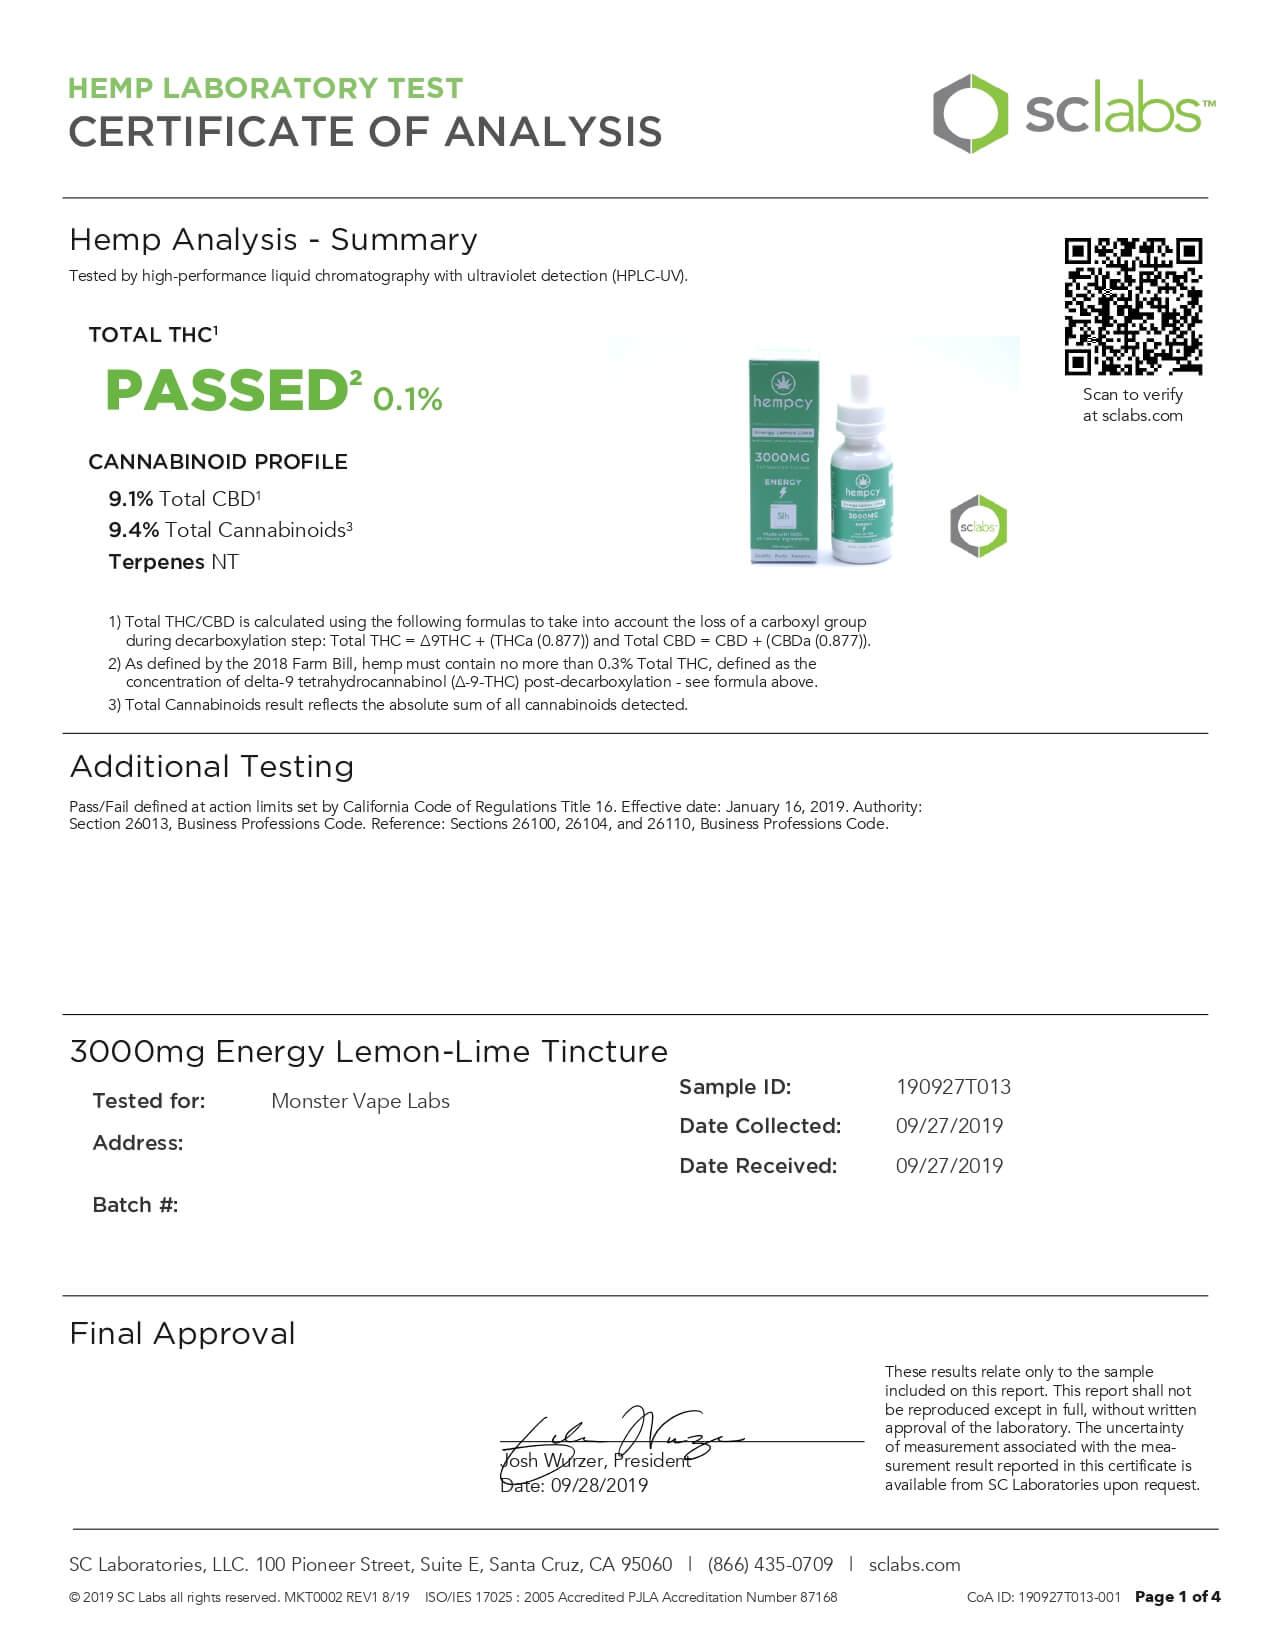 Hempcy CBD Tincture Energy Lemon Lime 3000mg Lab Report